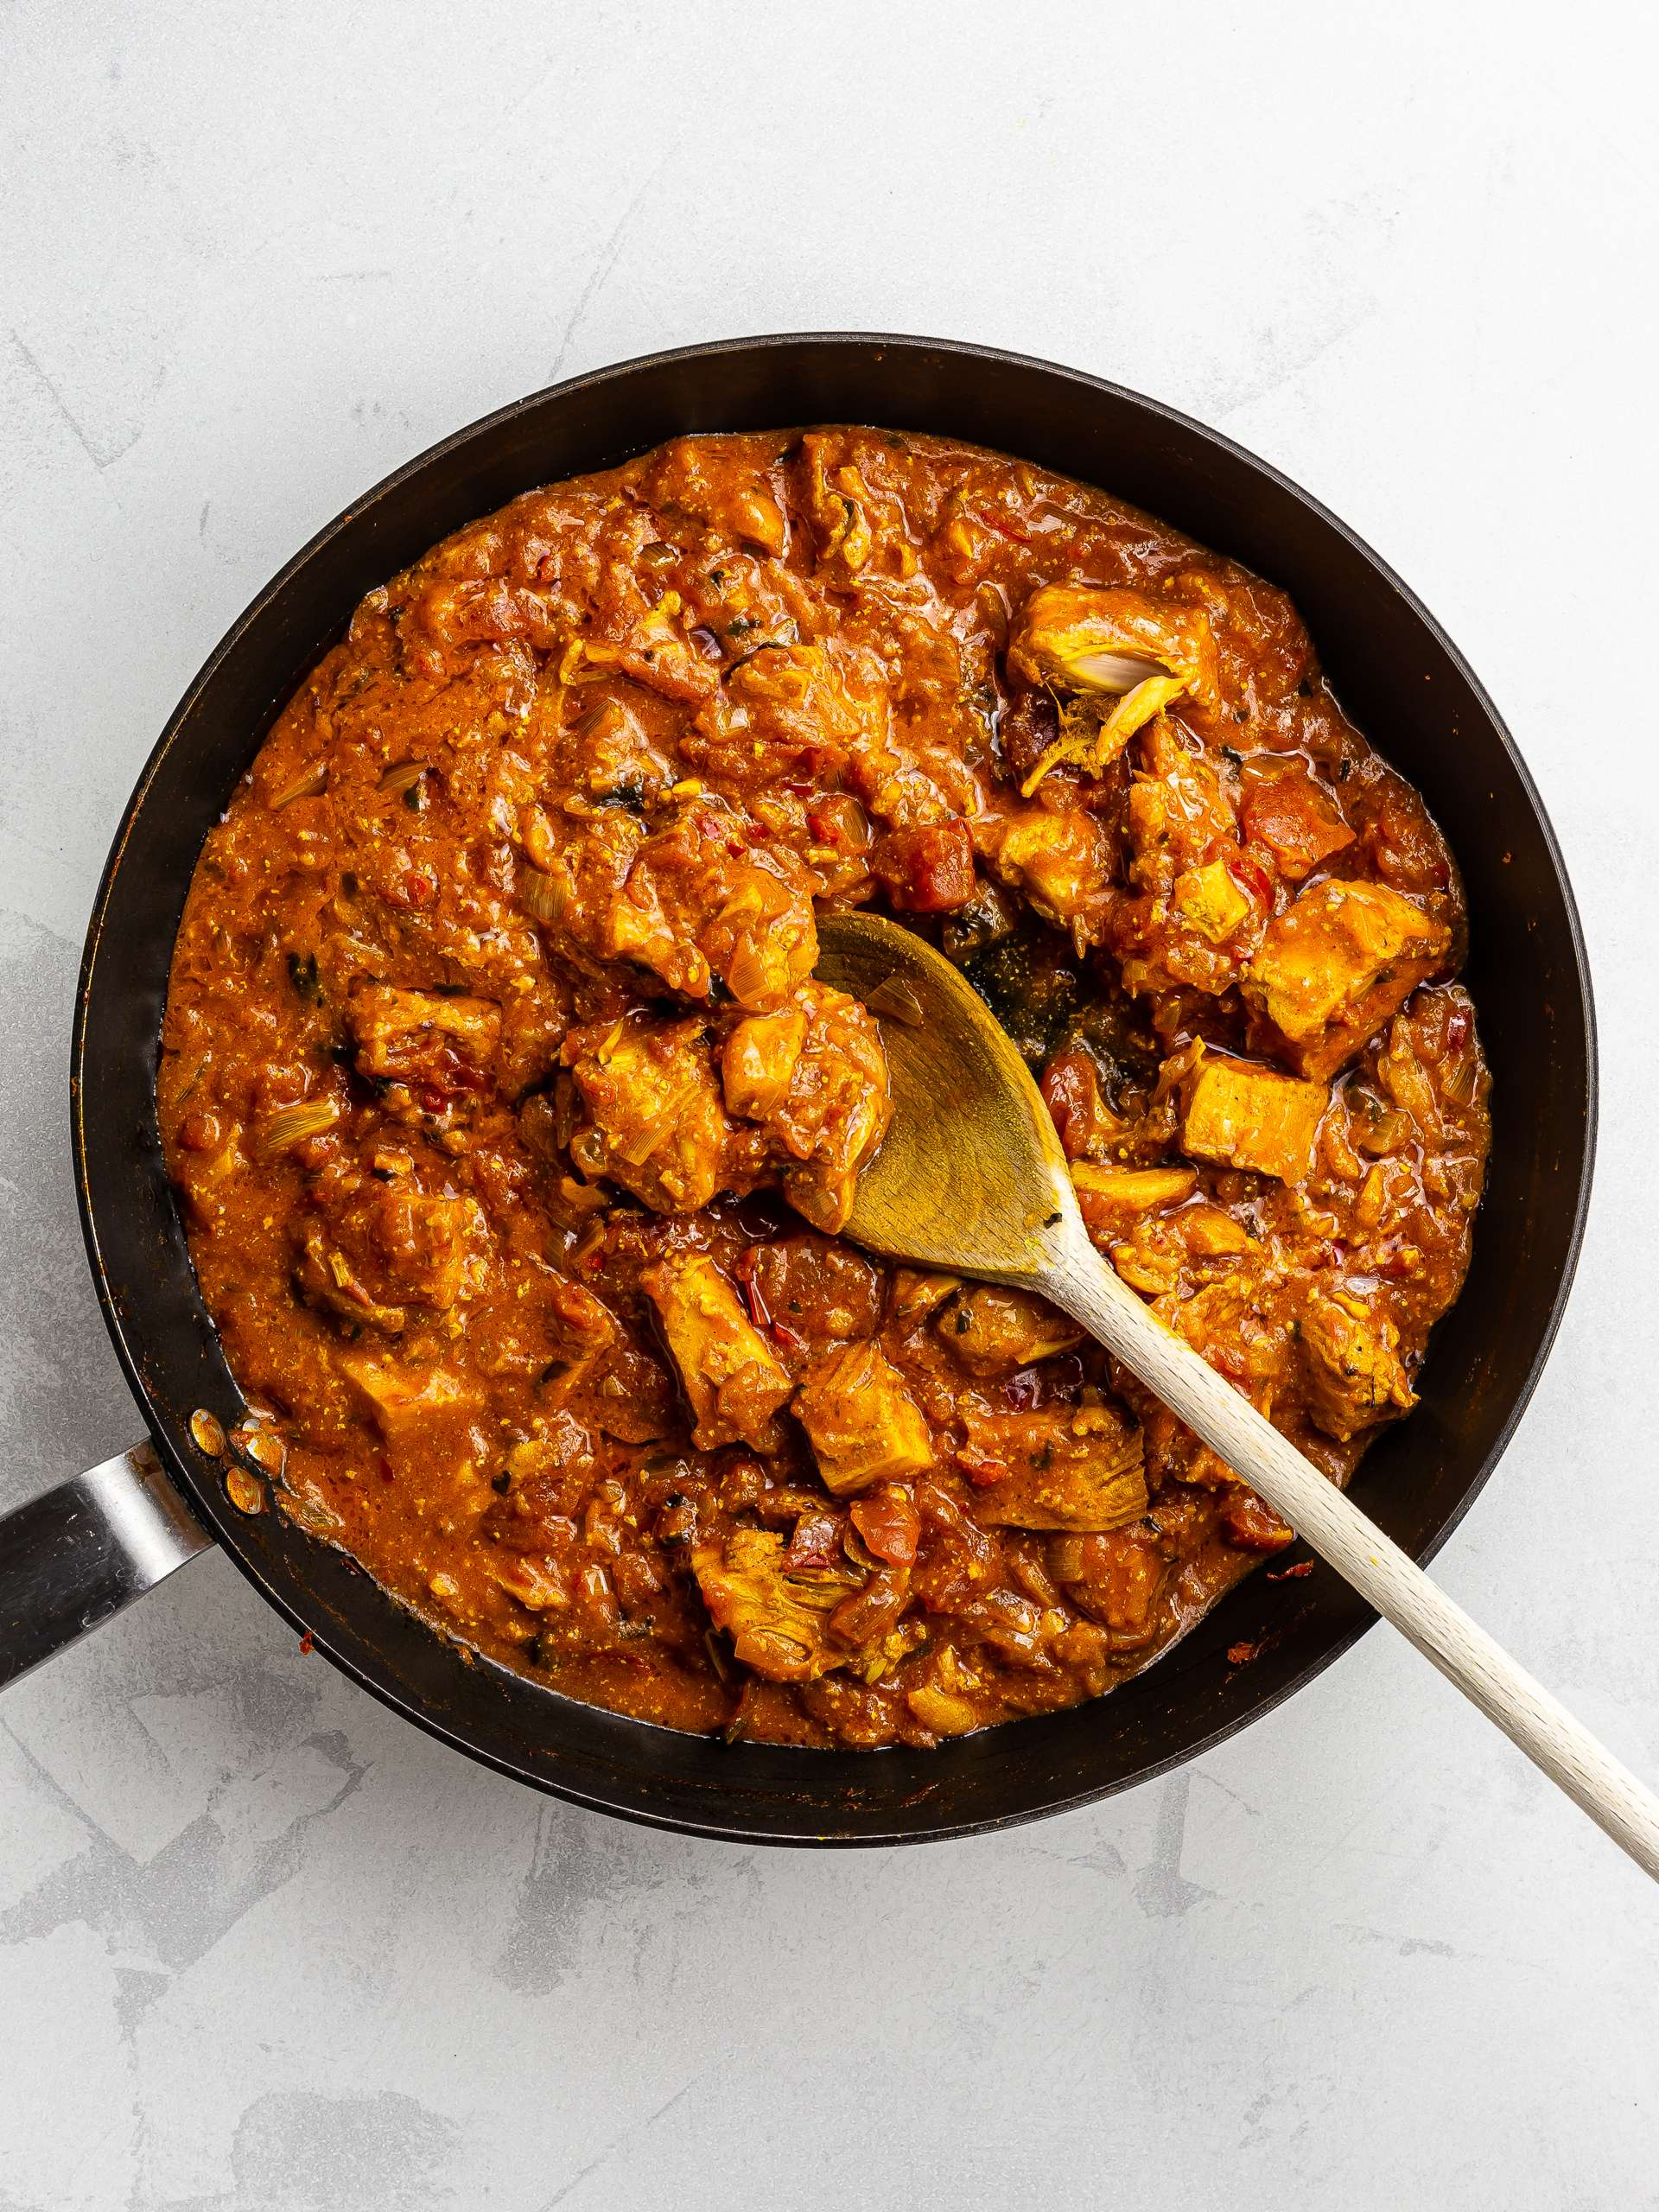 jackfruit tikka masala curry in a skillet